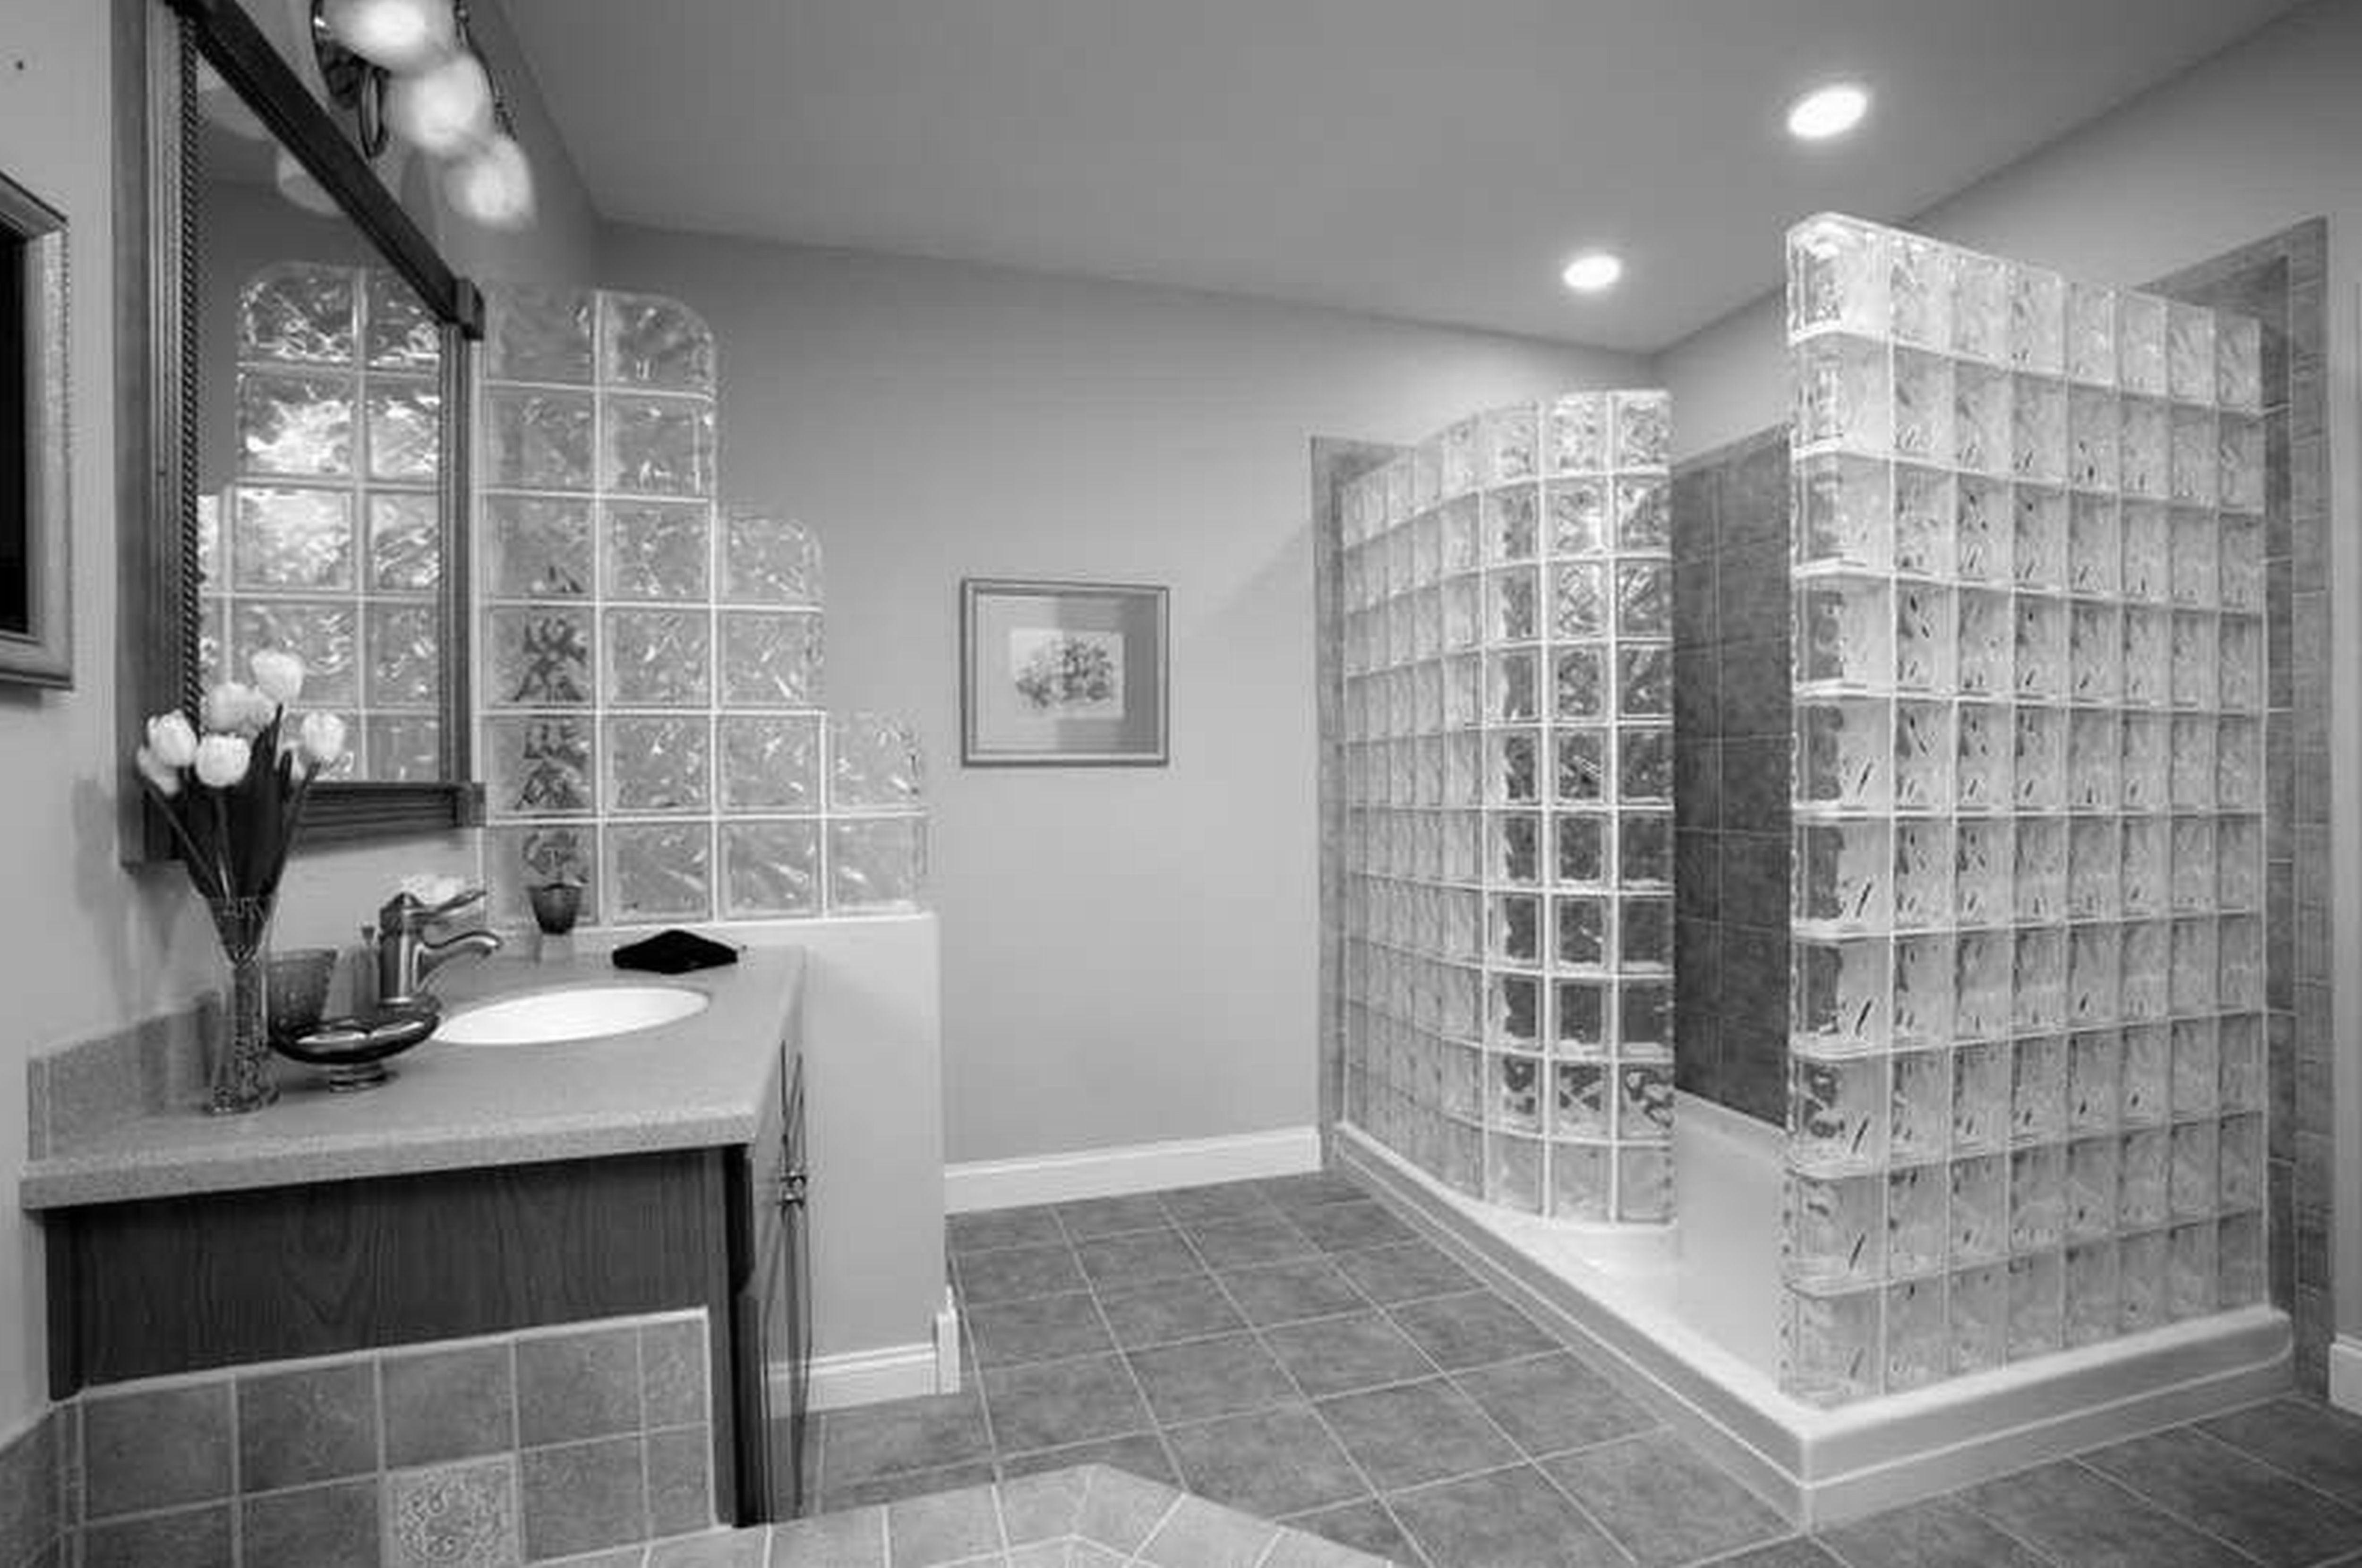 Bathroom Ceramic Tile Ideas Bathroom Tile Designs Scenic Implements Balance Ceramic Tile Modern Bathroom Design Bathroom Shower Walls White Bathroom Tiles